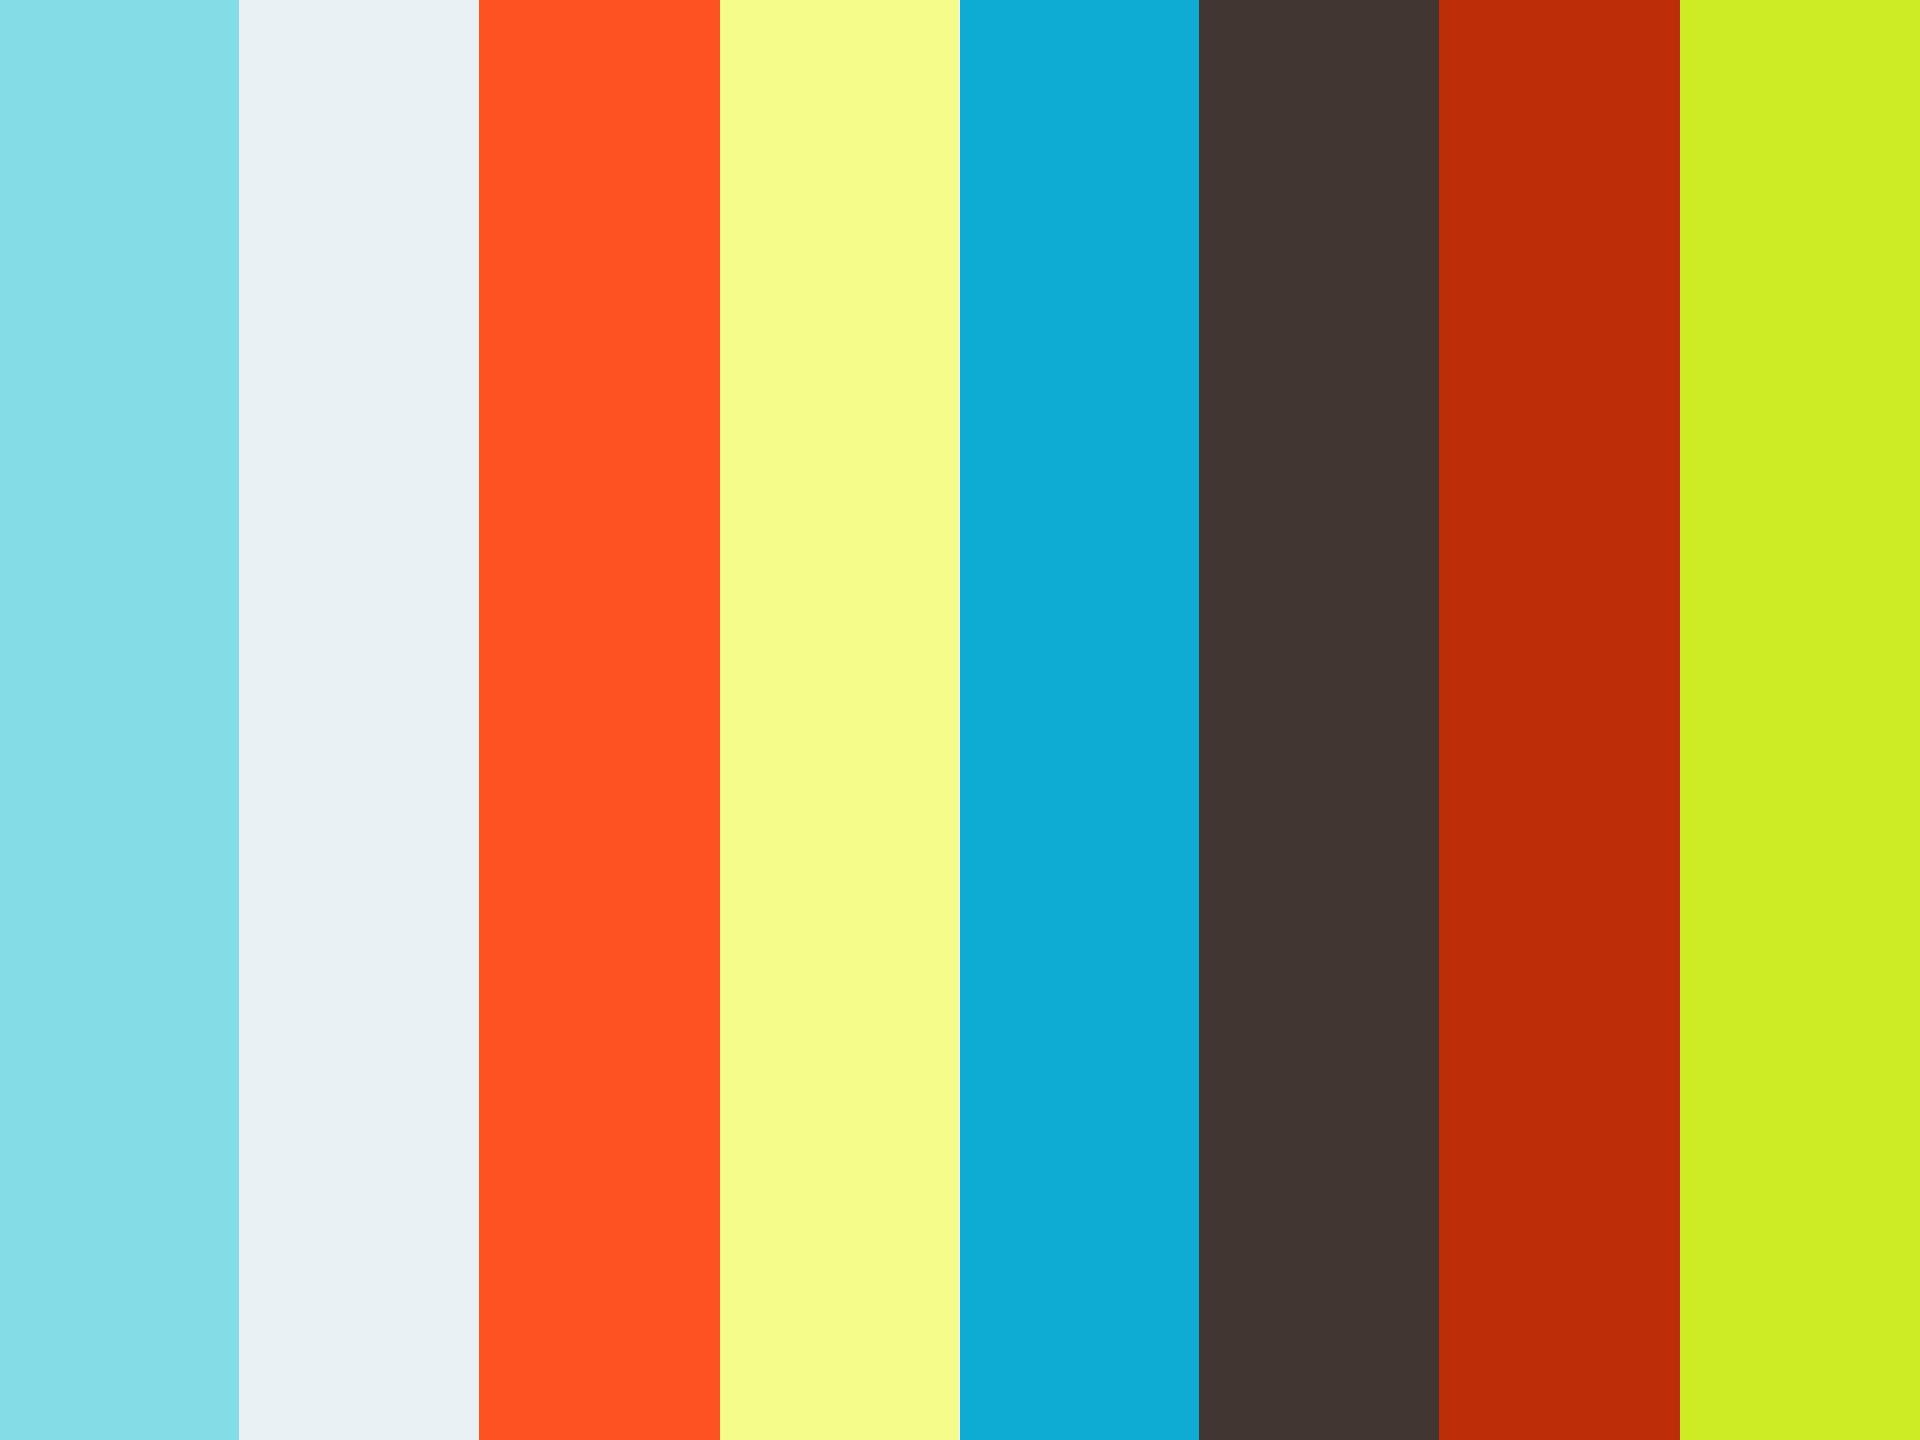 IPS e.max ジルキャド MT マルチ チェアサイドブロック草間幸夫先生によるビデオセミナー 【全10動画】 #3 酸化ジルコニウムの基礎知識